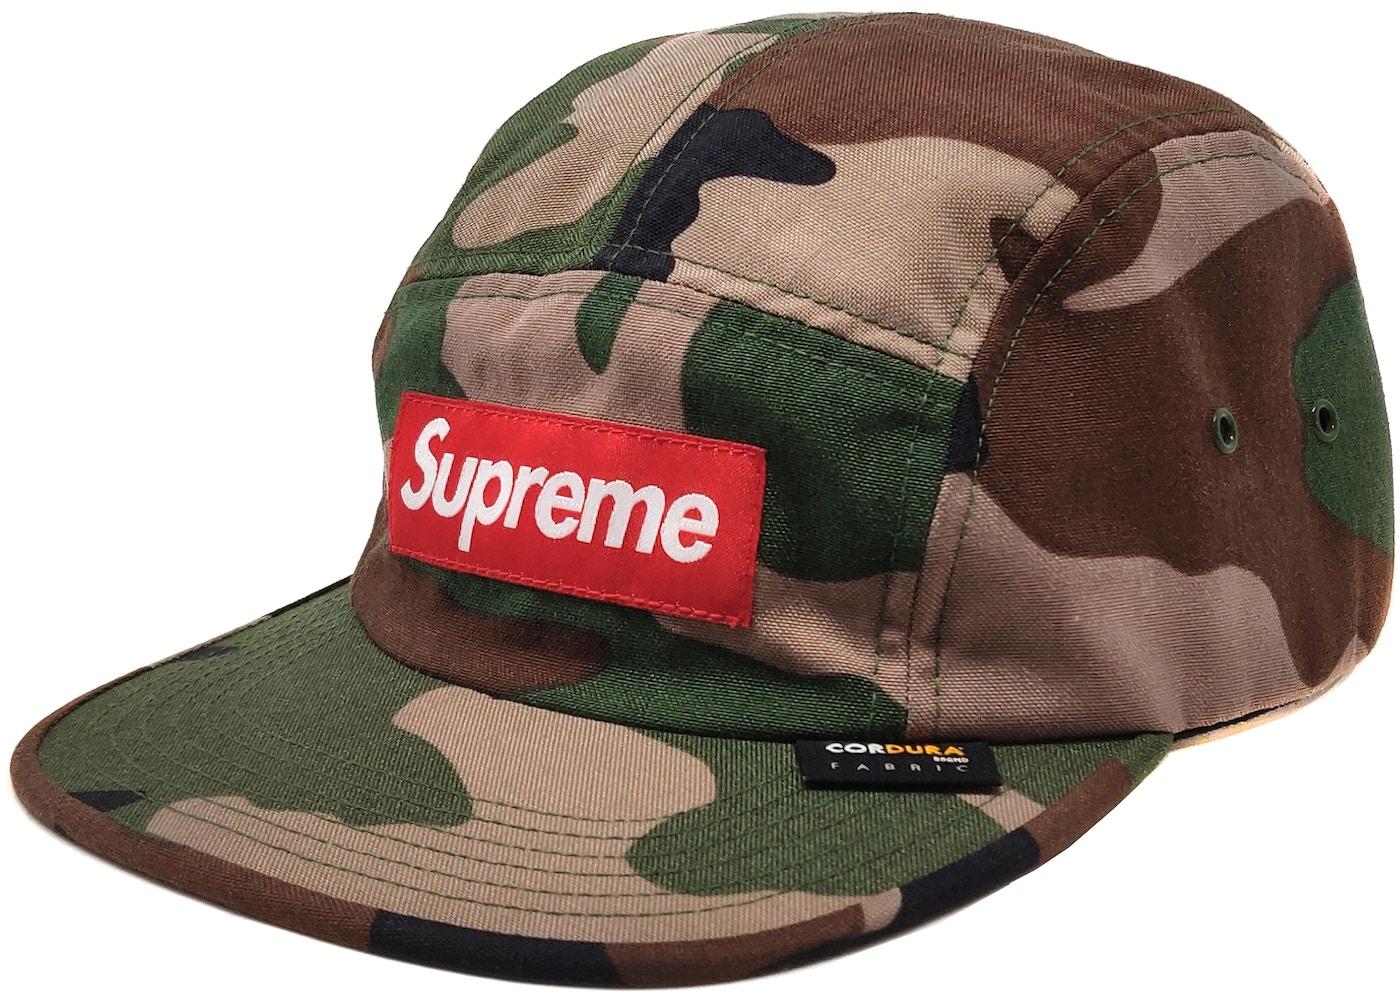 82319f6d5cc Streetwear - Supreme Headwear - Average Sale Price